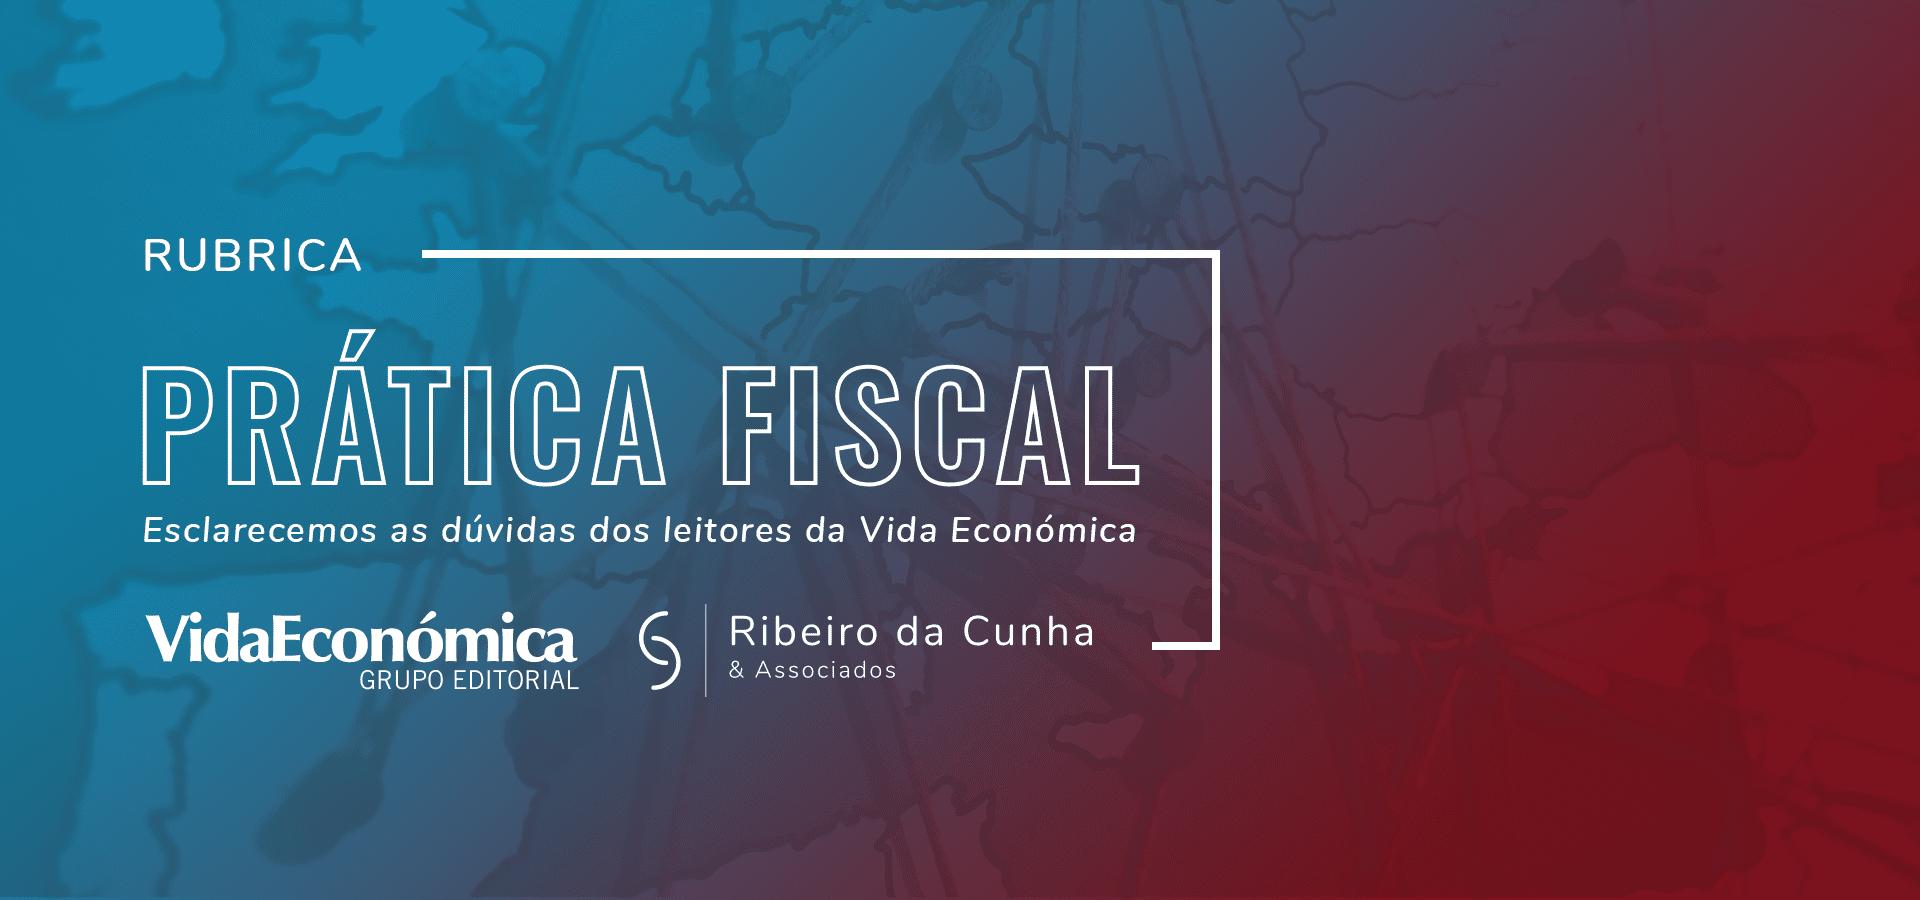 Prática Fiscal - Rubrica Vida Económica